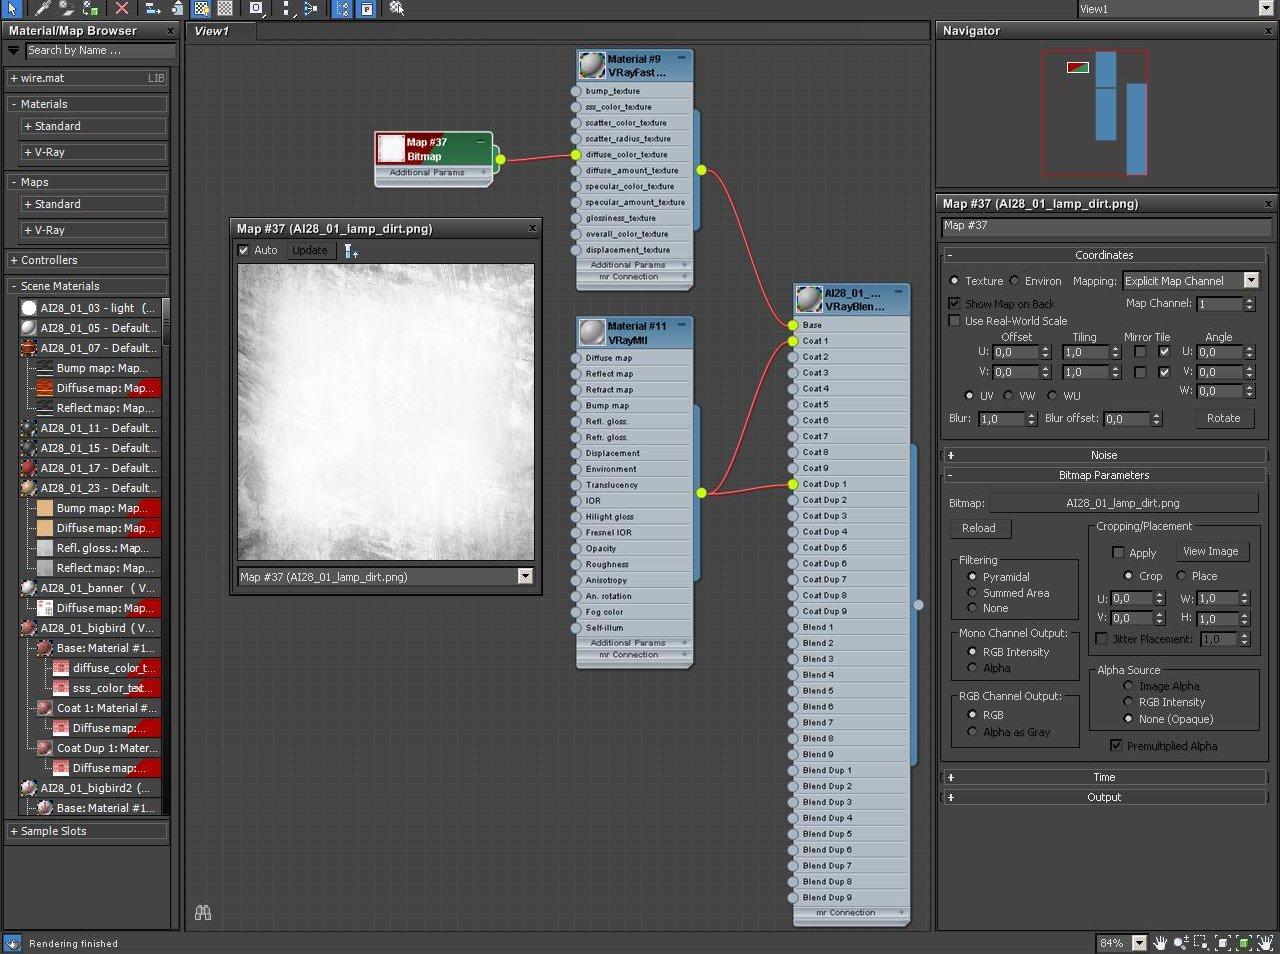 light_translucent_coat_map_nr_2427.jpg